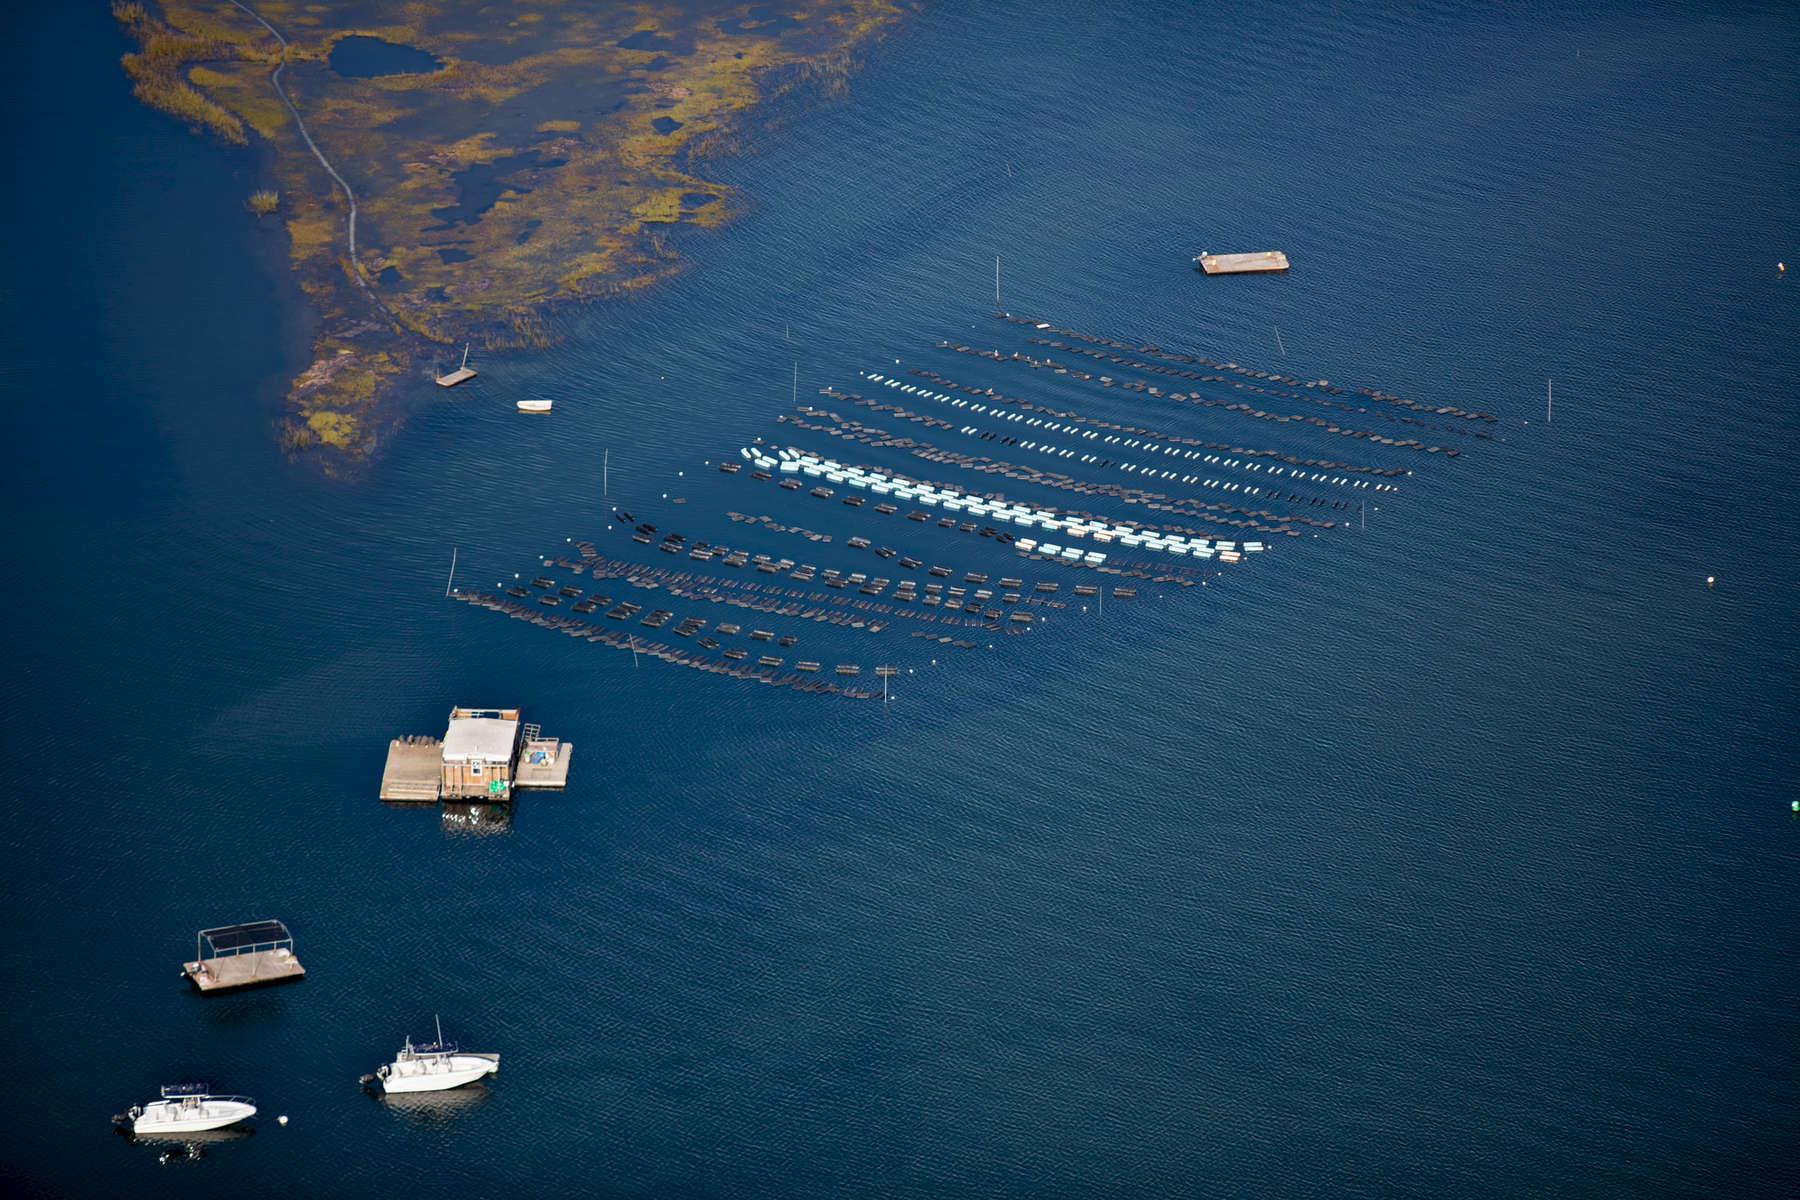 Floats, Chatham, Massachusetts 2018 (180930-0293)